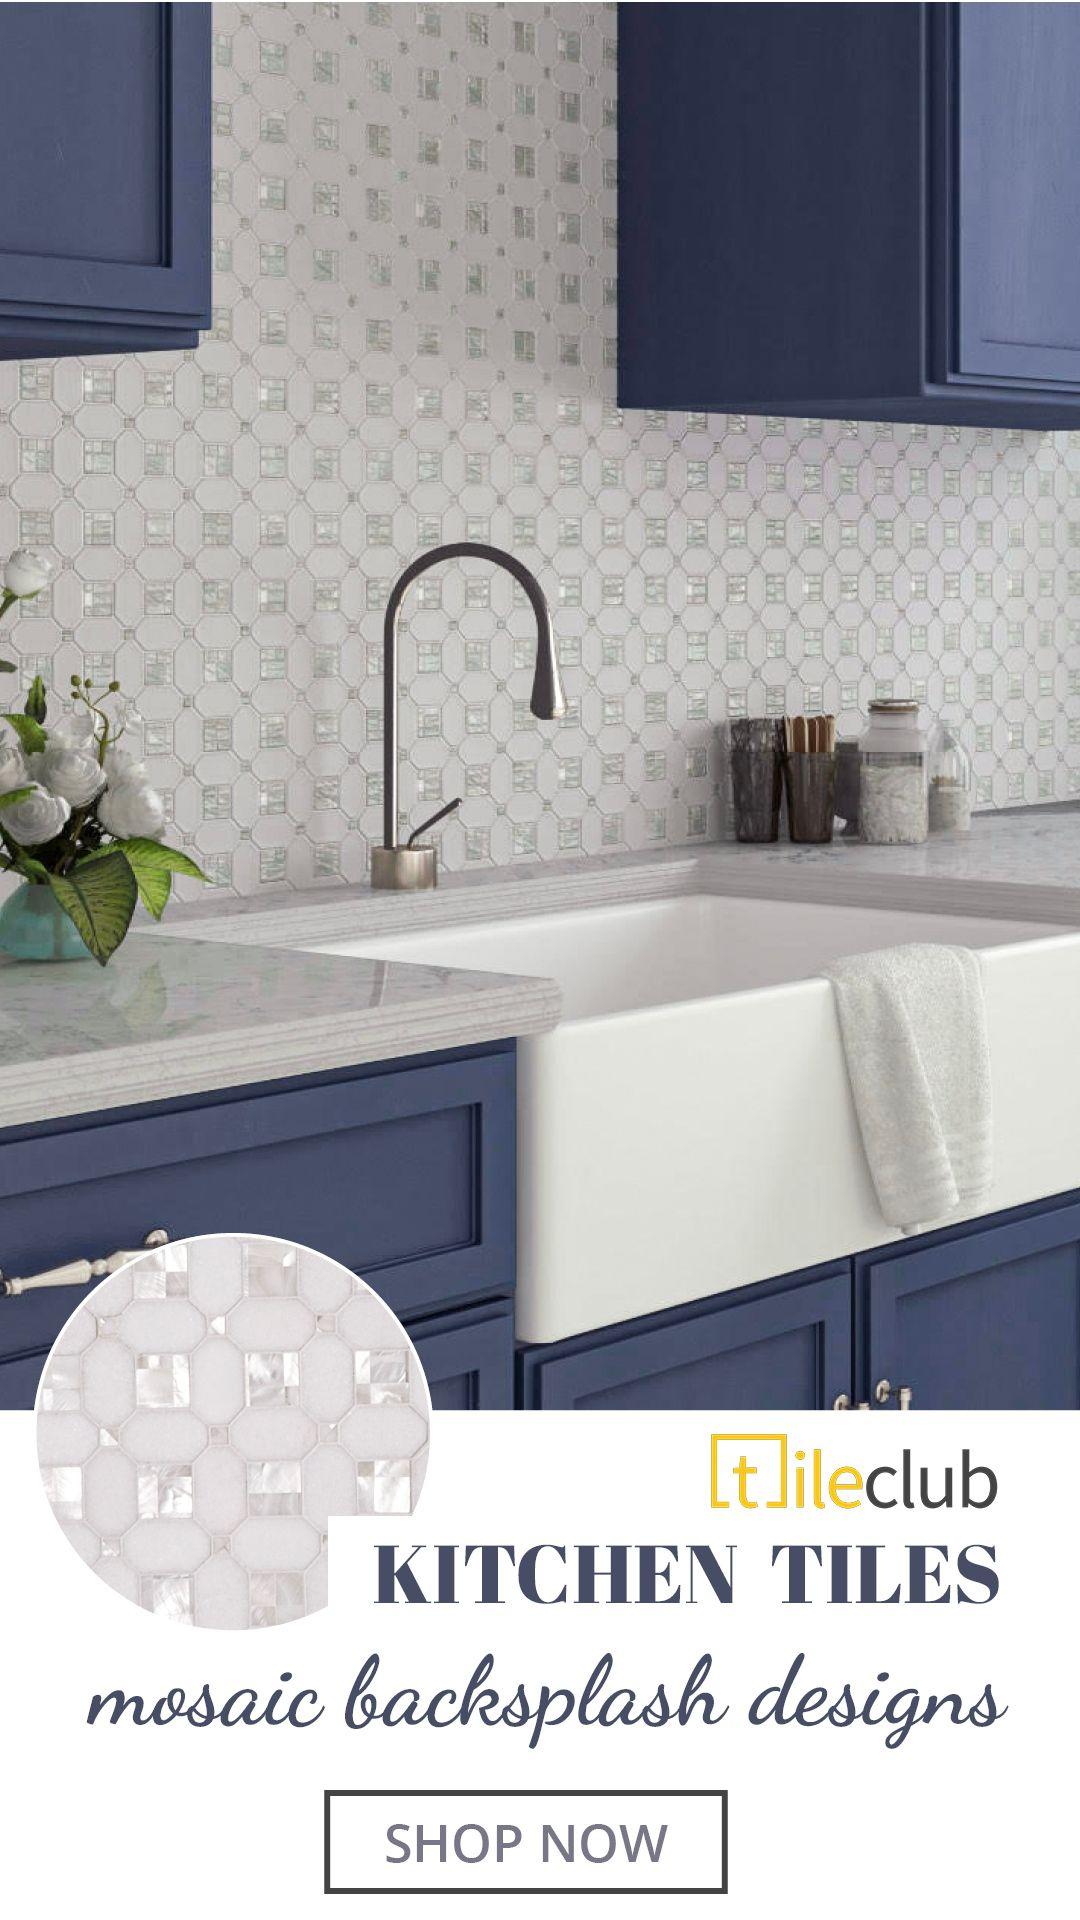 Creative Mosaic Tiles For Kitchen Bathroom And Beyond Kitchen Backsplash Designs Lake House Kitchen Kitchen Remodel Small